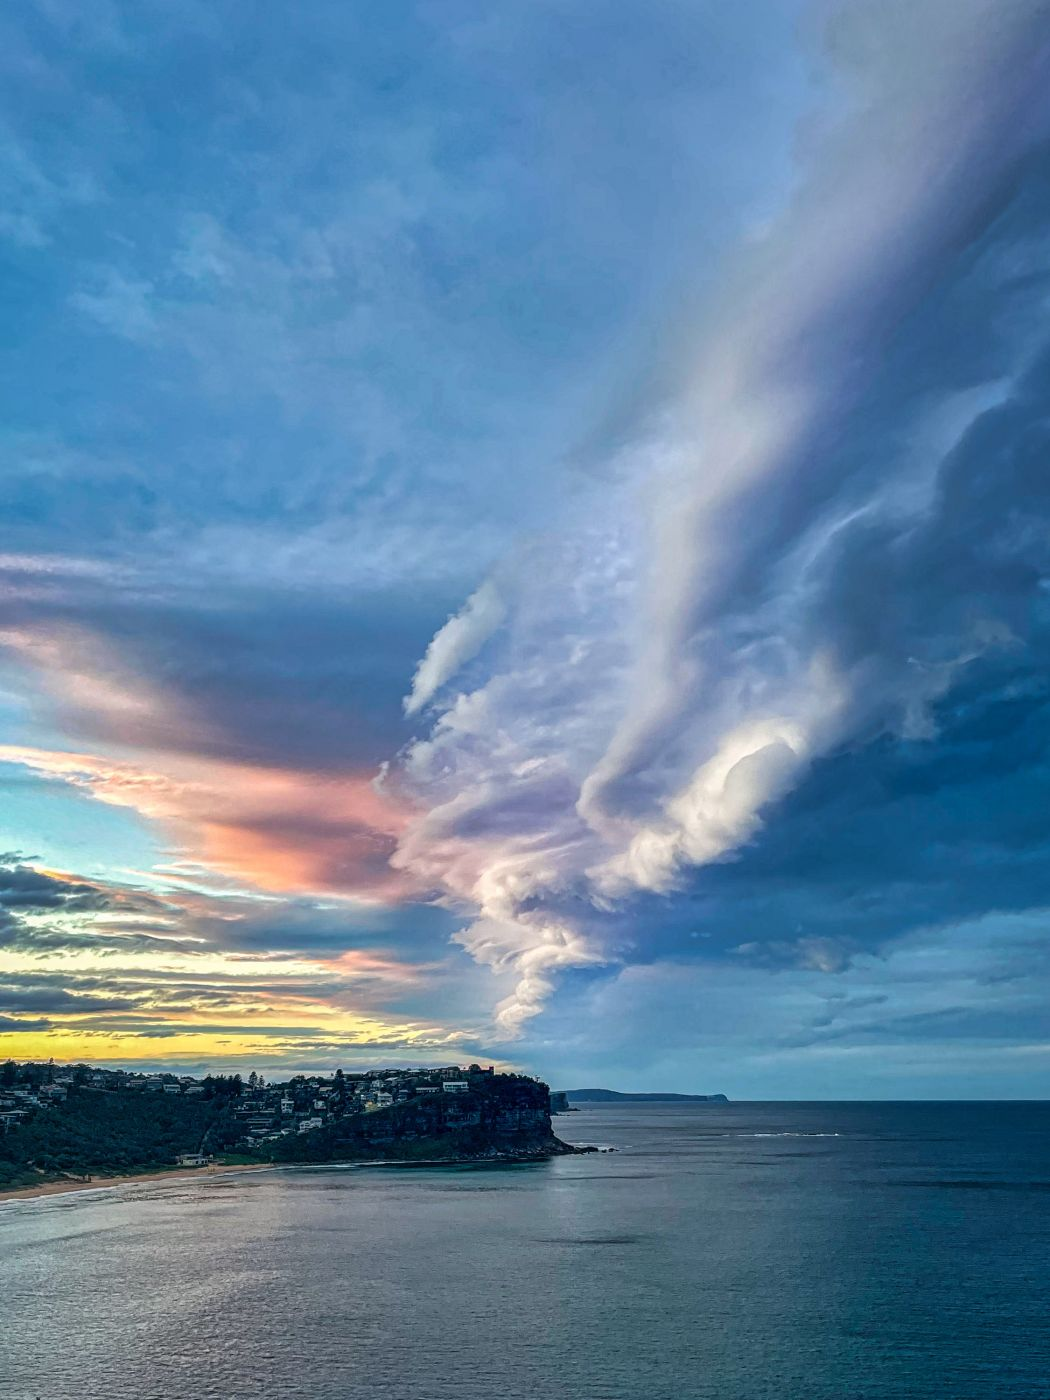 Cloud formation Bungan Headland, Mona Vale, Australia